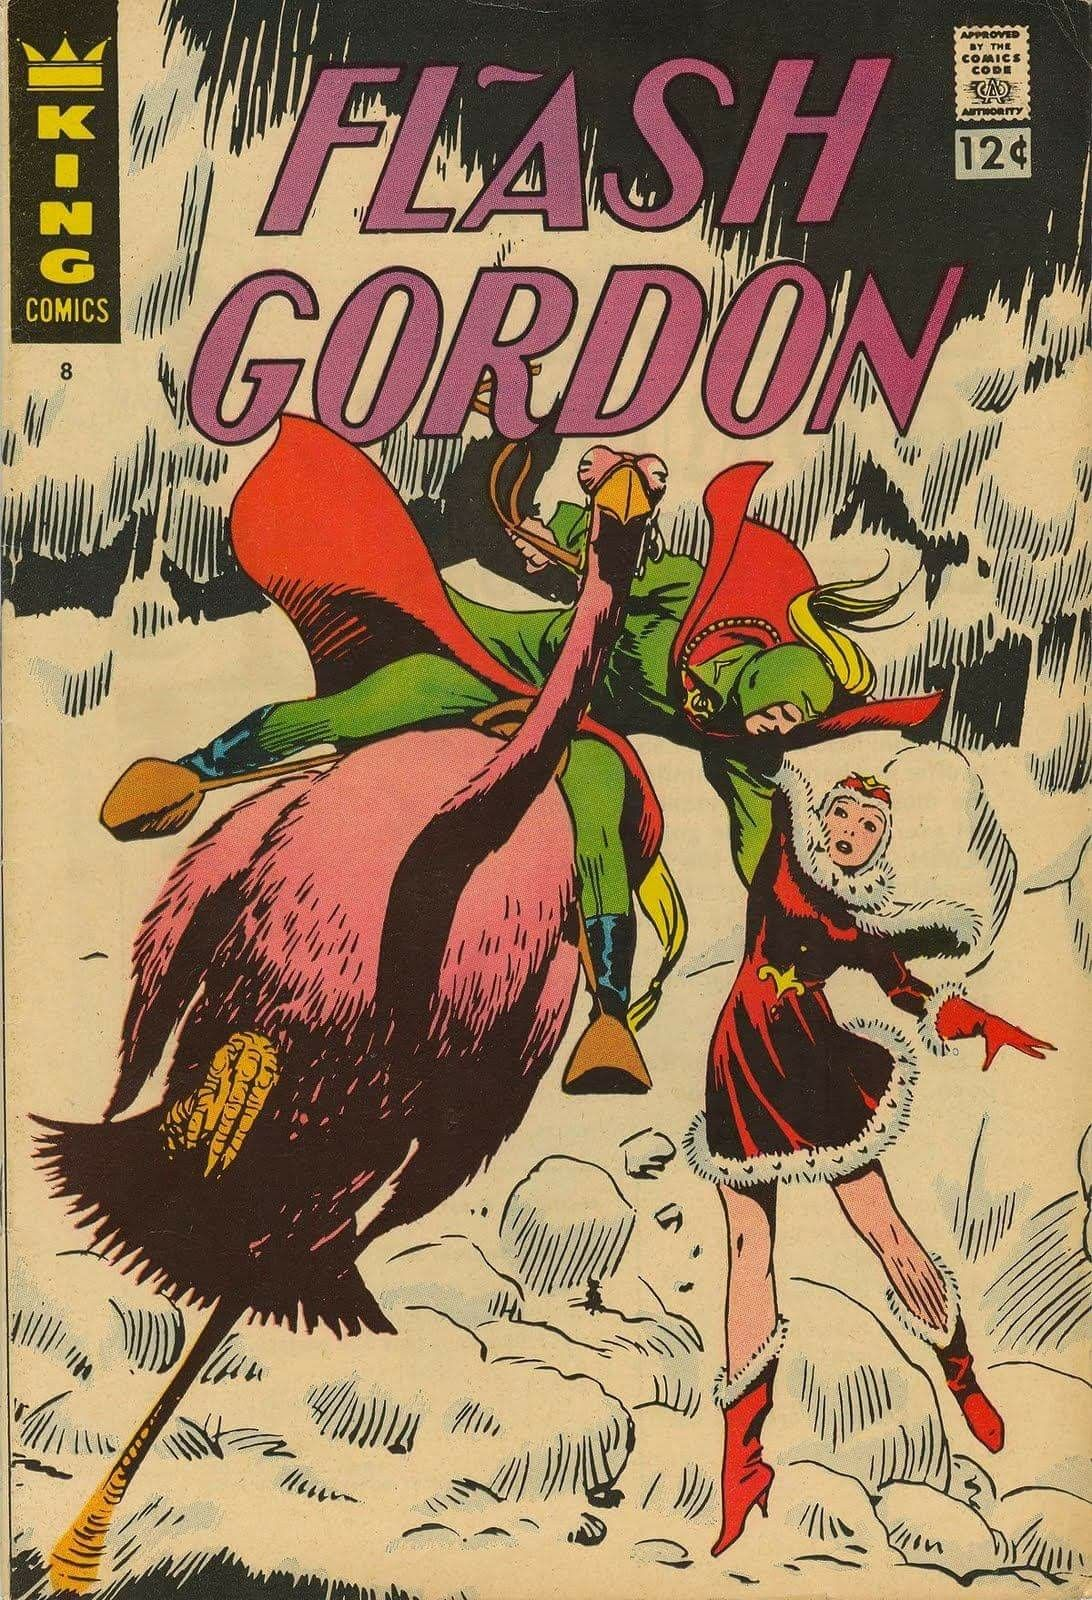 Pin by Kevin Measimer on Holidays | Flash gordon comic